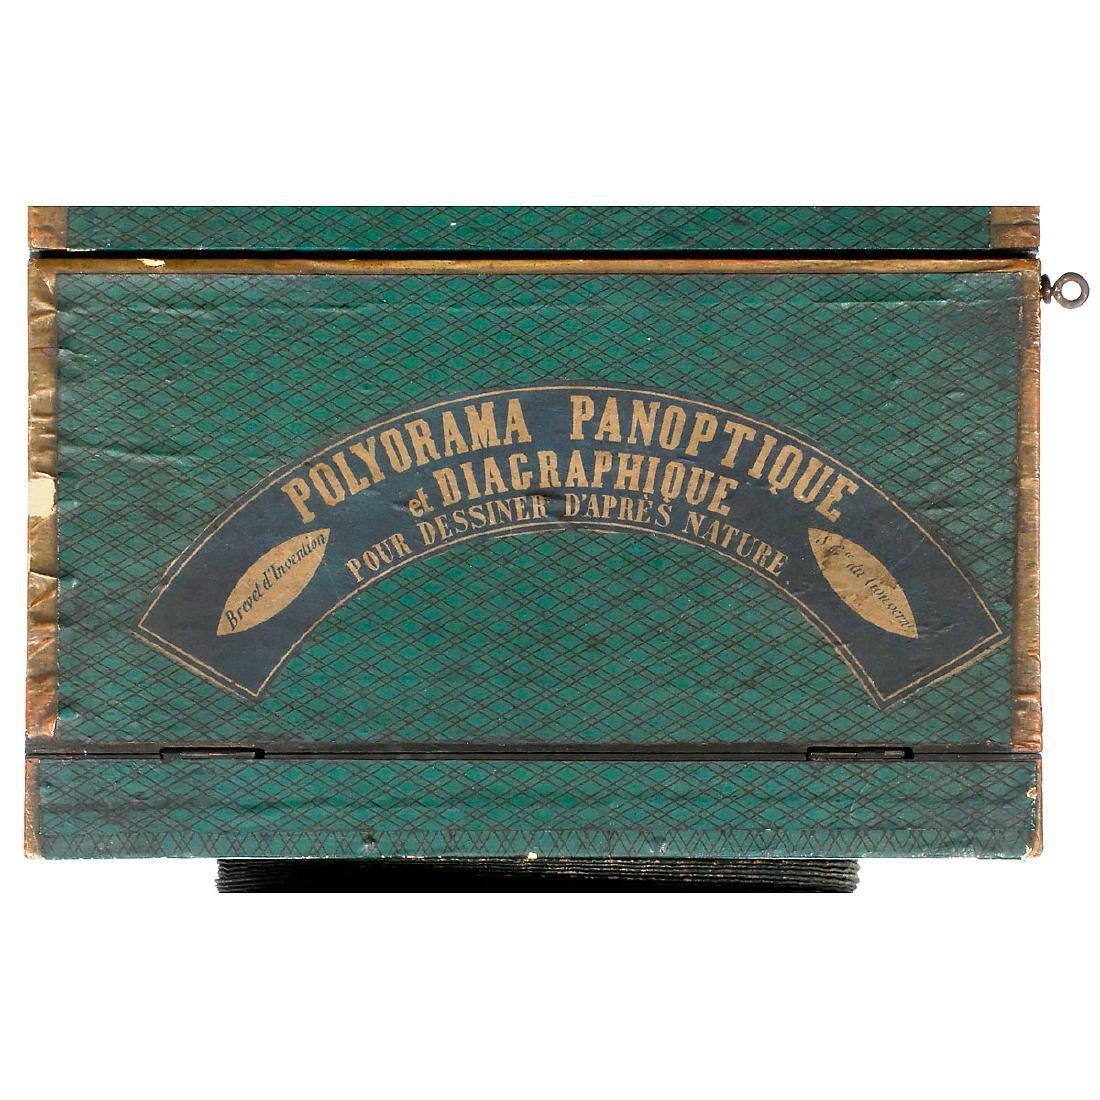 Polyorama Panoptique, c. 1850 - 2